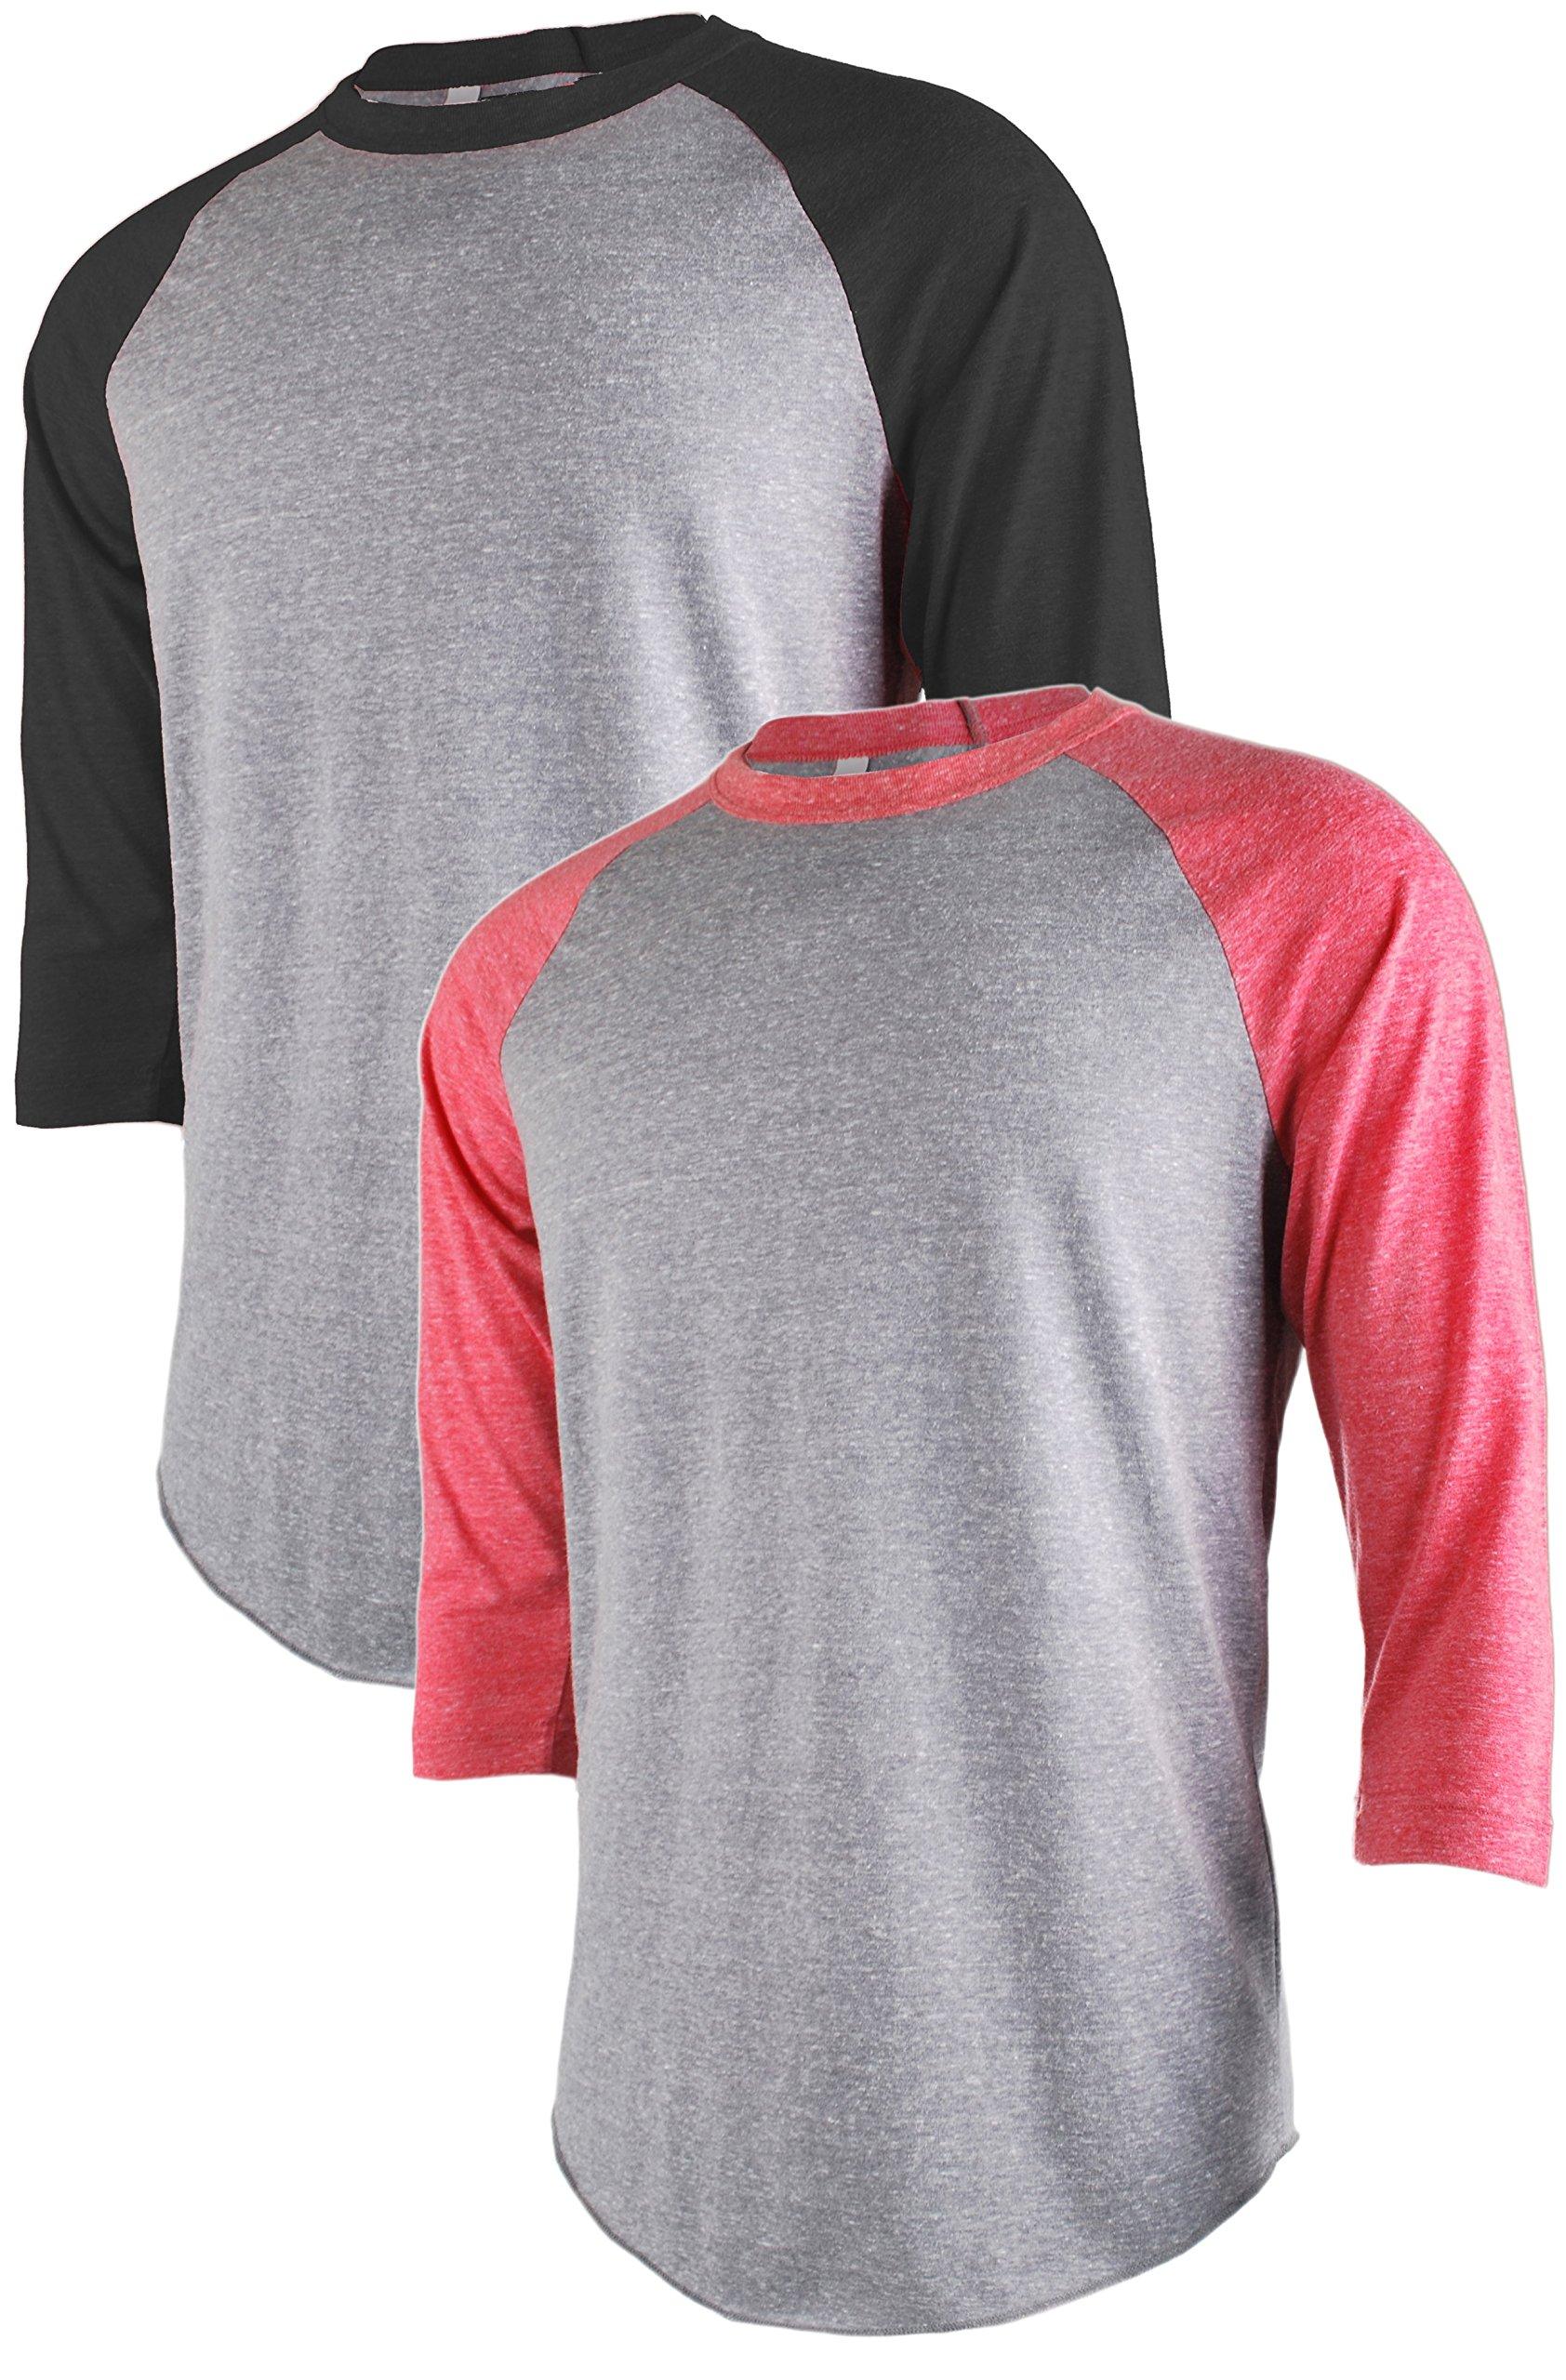 TOP LEGGING TL Men's Active Basic 3/4 and Long Sleeve Baseball Raglan Crew Neck Shirt SET2_LGRBLK_LGRRED L